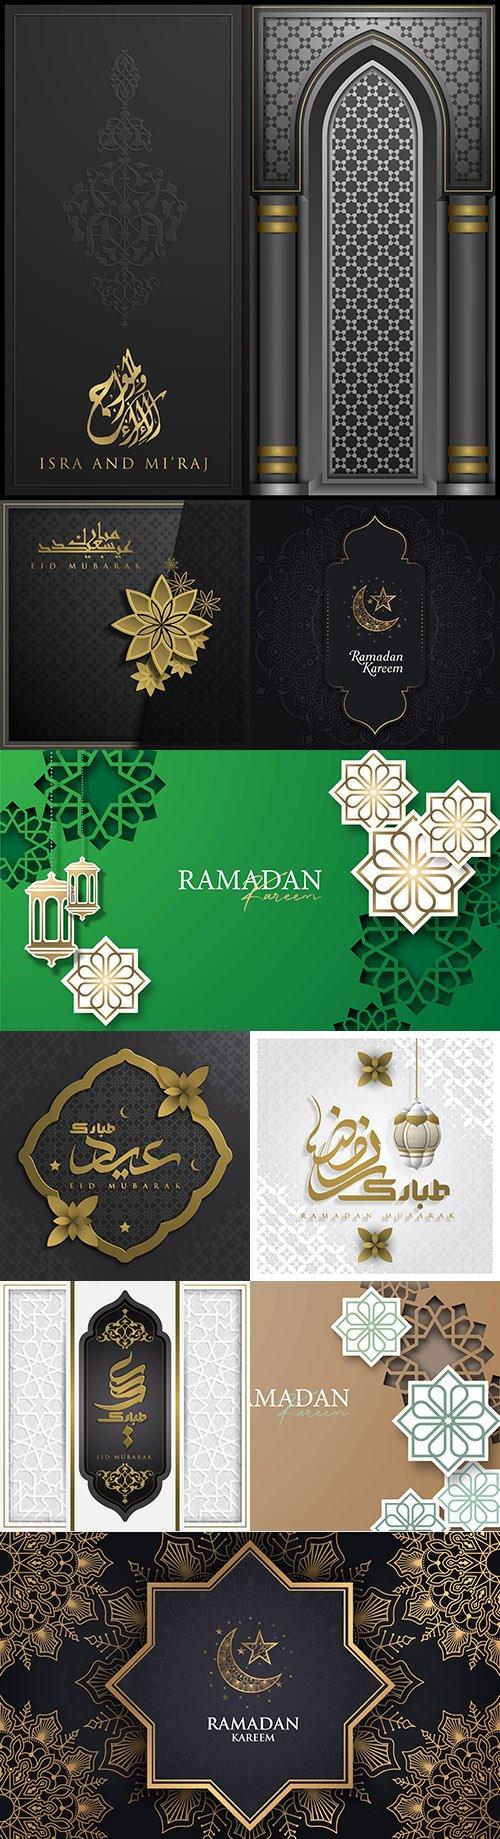 Eid Mubarak and Ramadan Kareem gold design with calligraphy